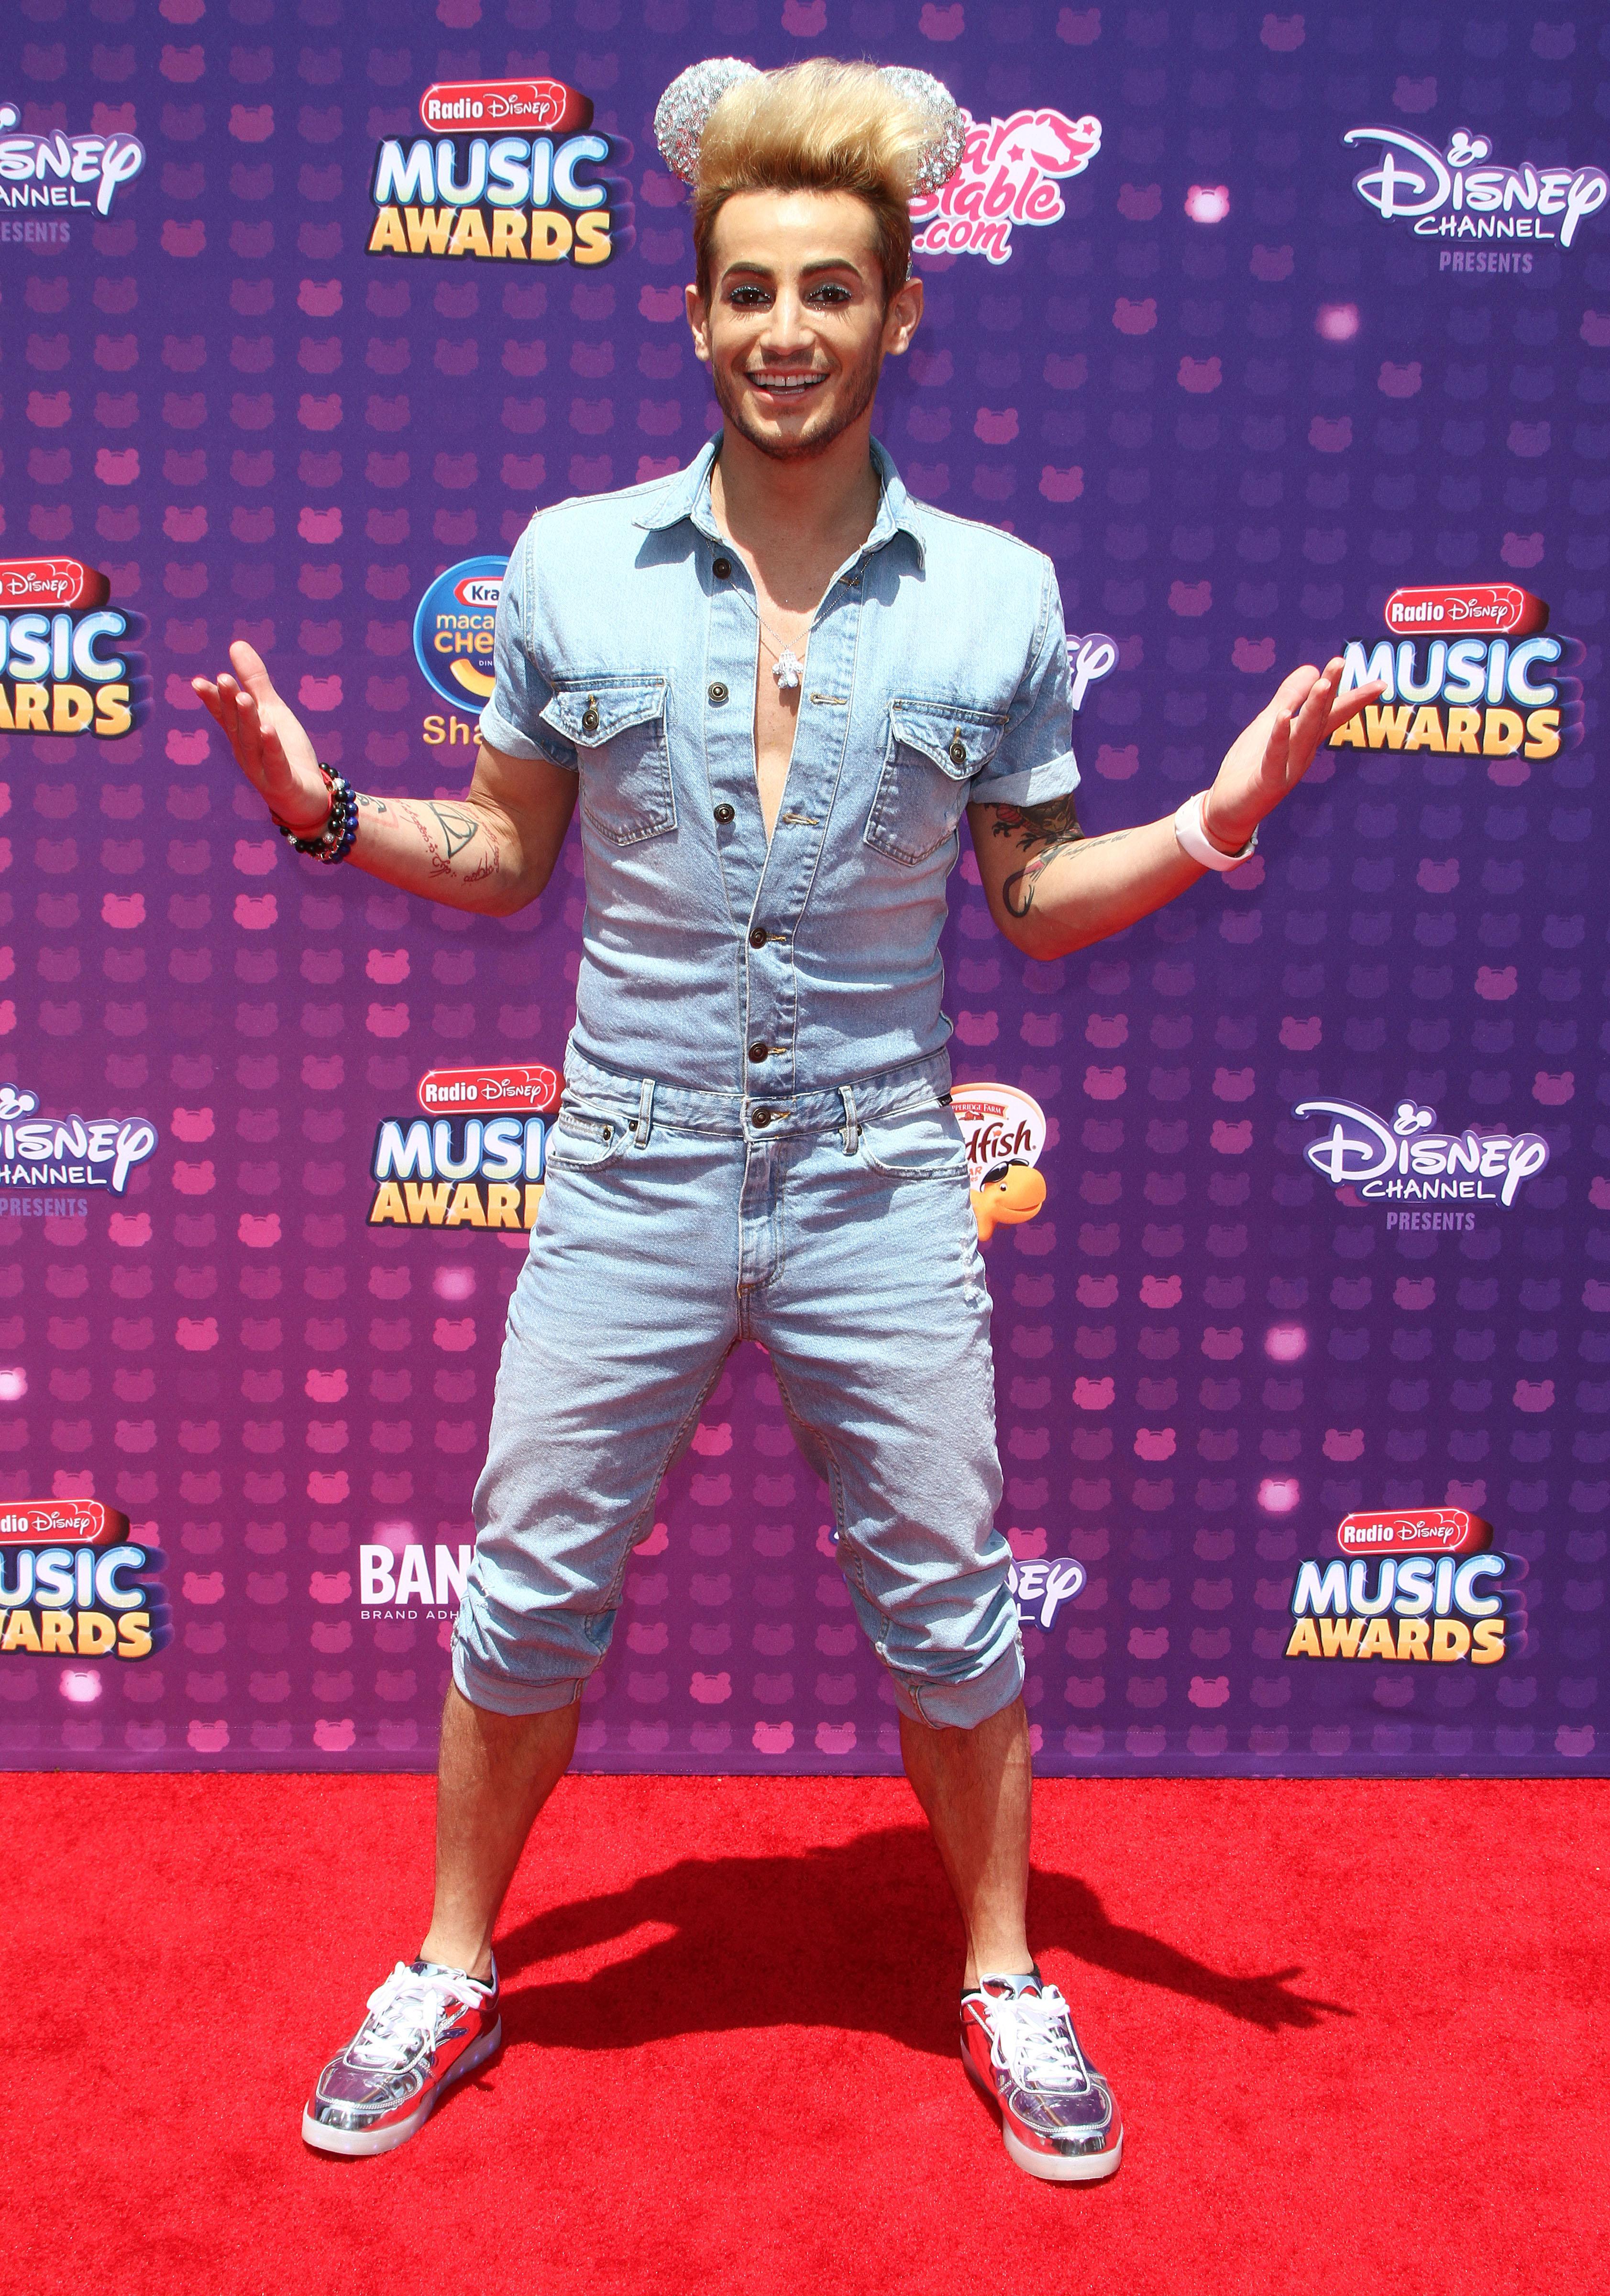 Radio Disney Music Awards' Top 10 wackiest, brightest red carpet looks [GALLERY]